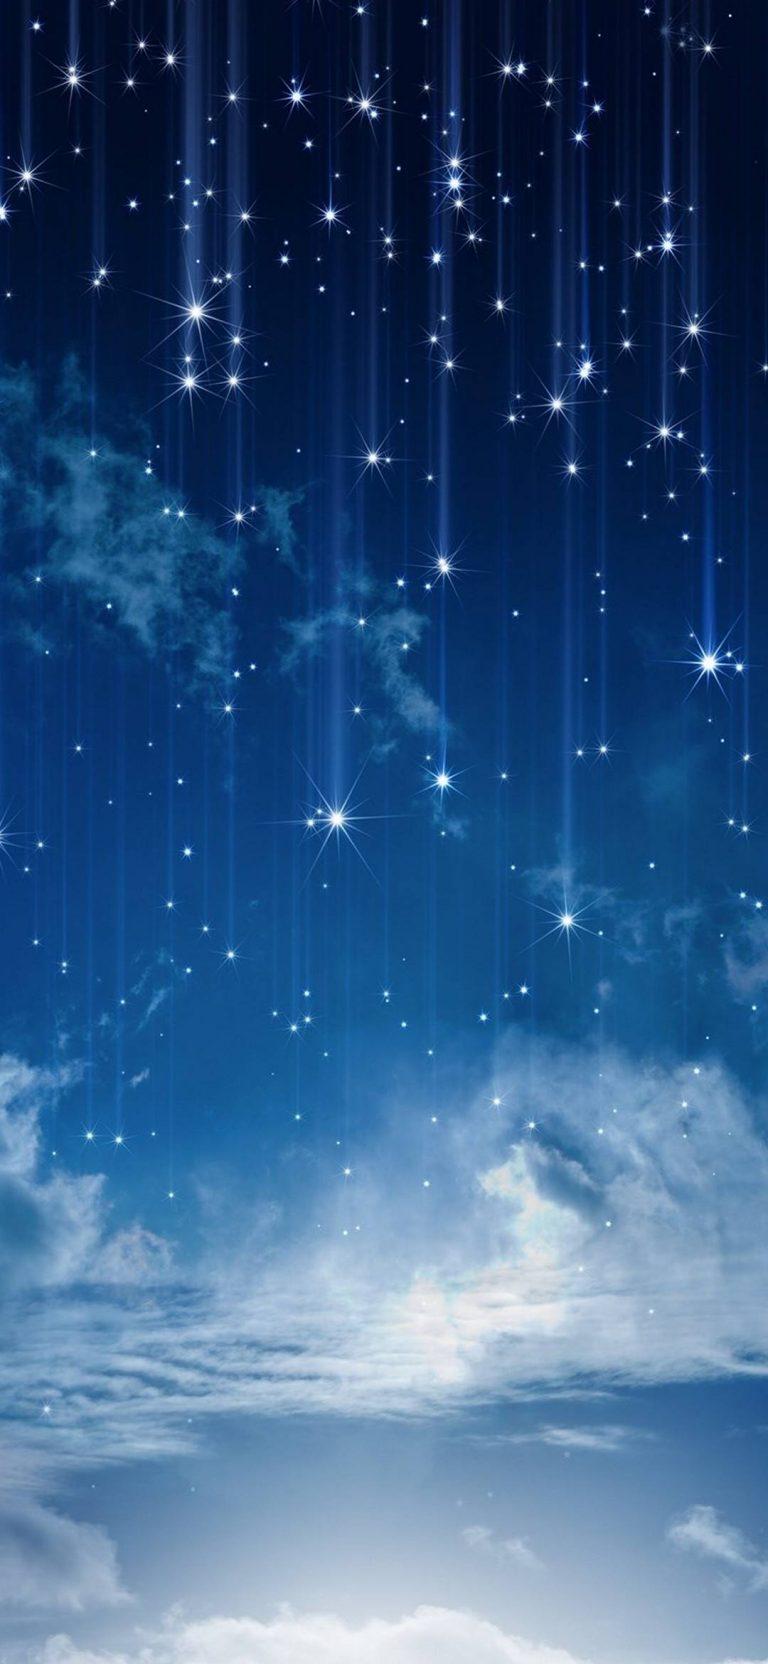 Sky Moonlight Nature Night Stars Clouds 1080x2340 768x1664